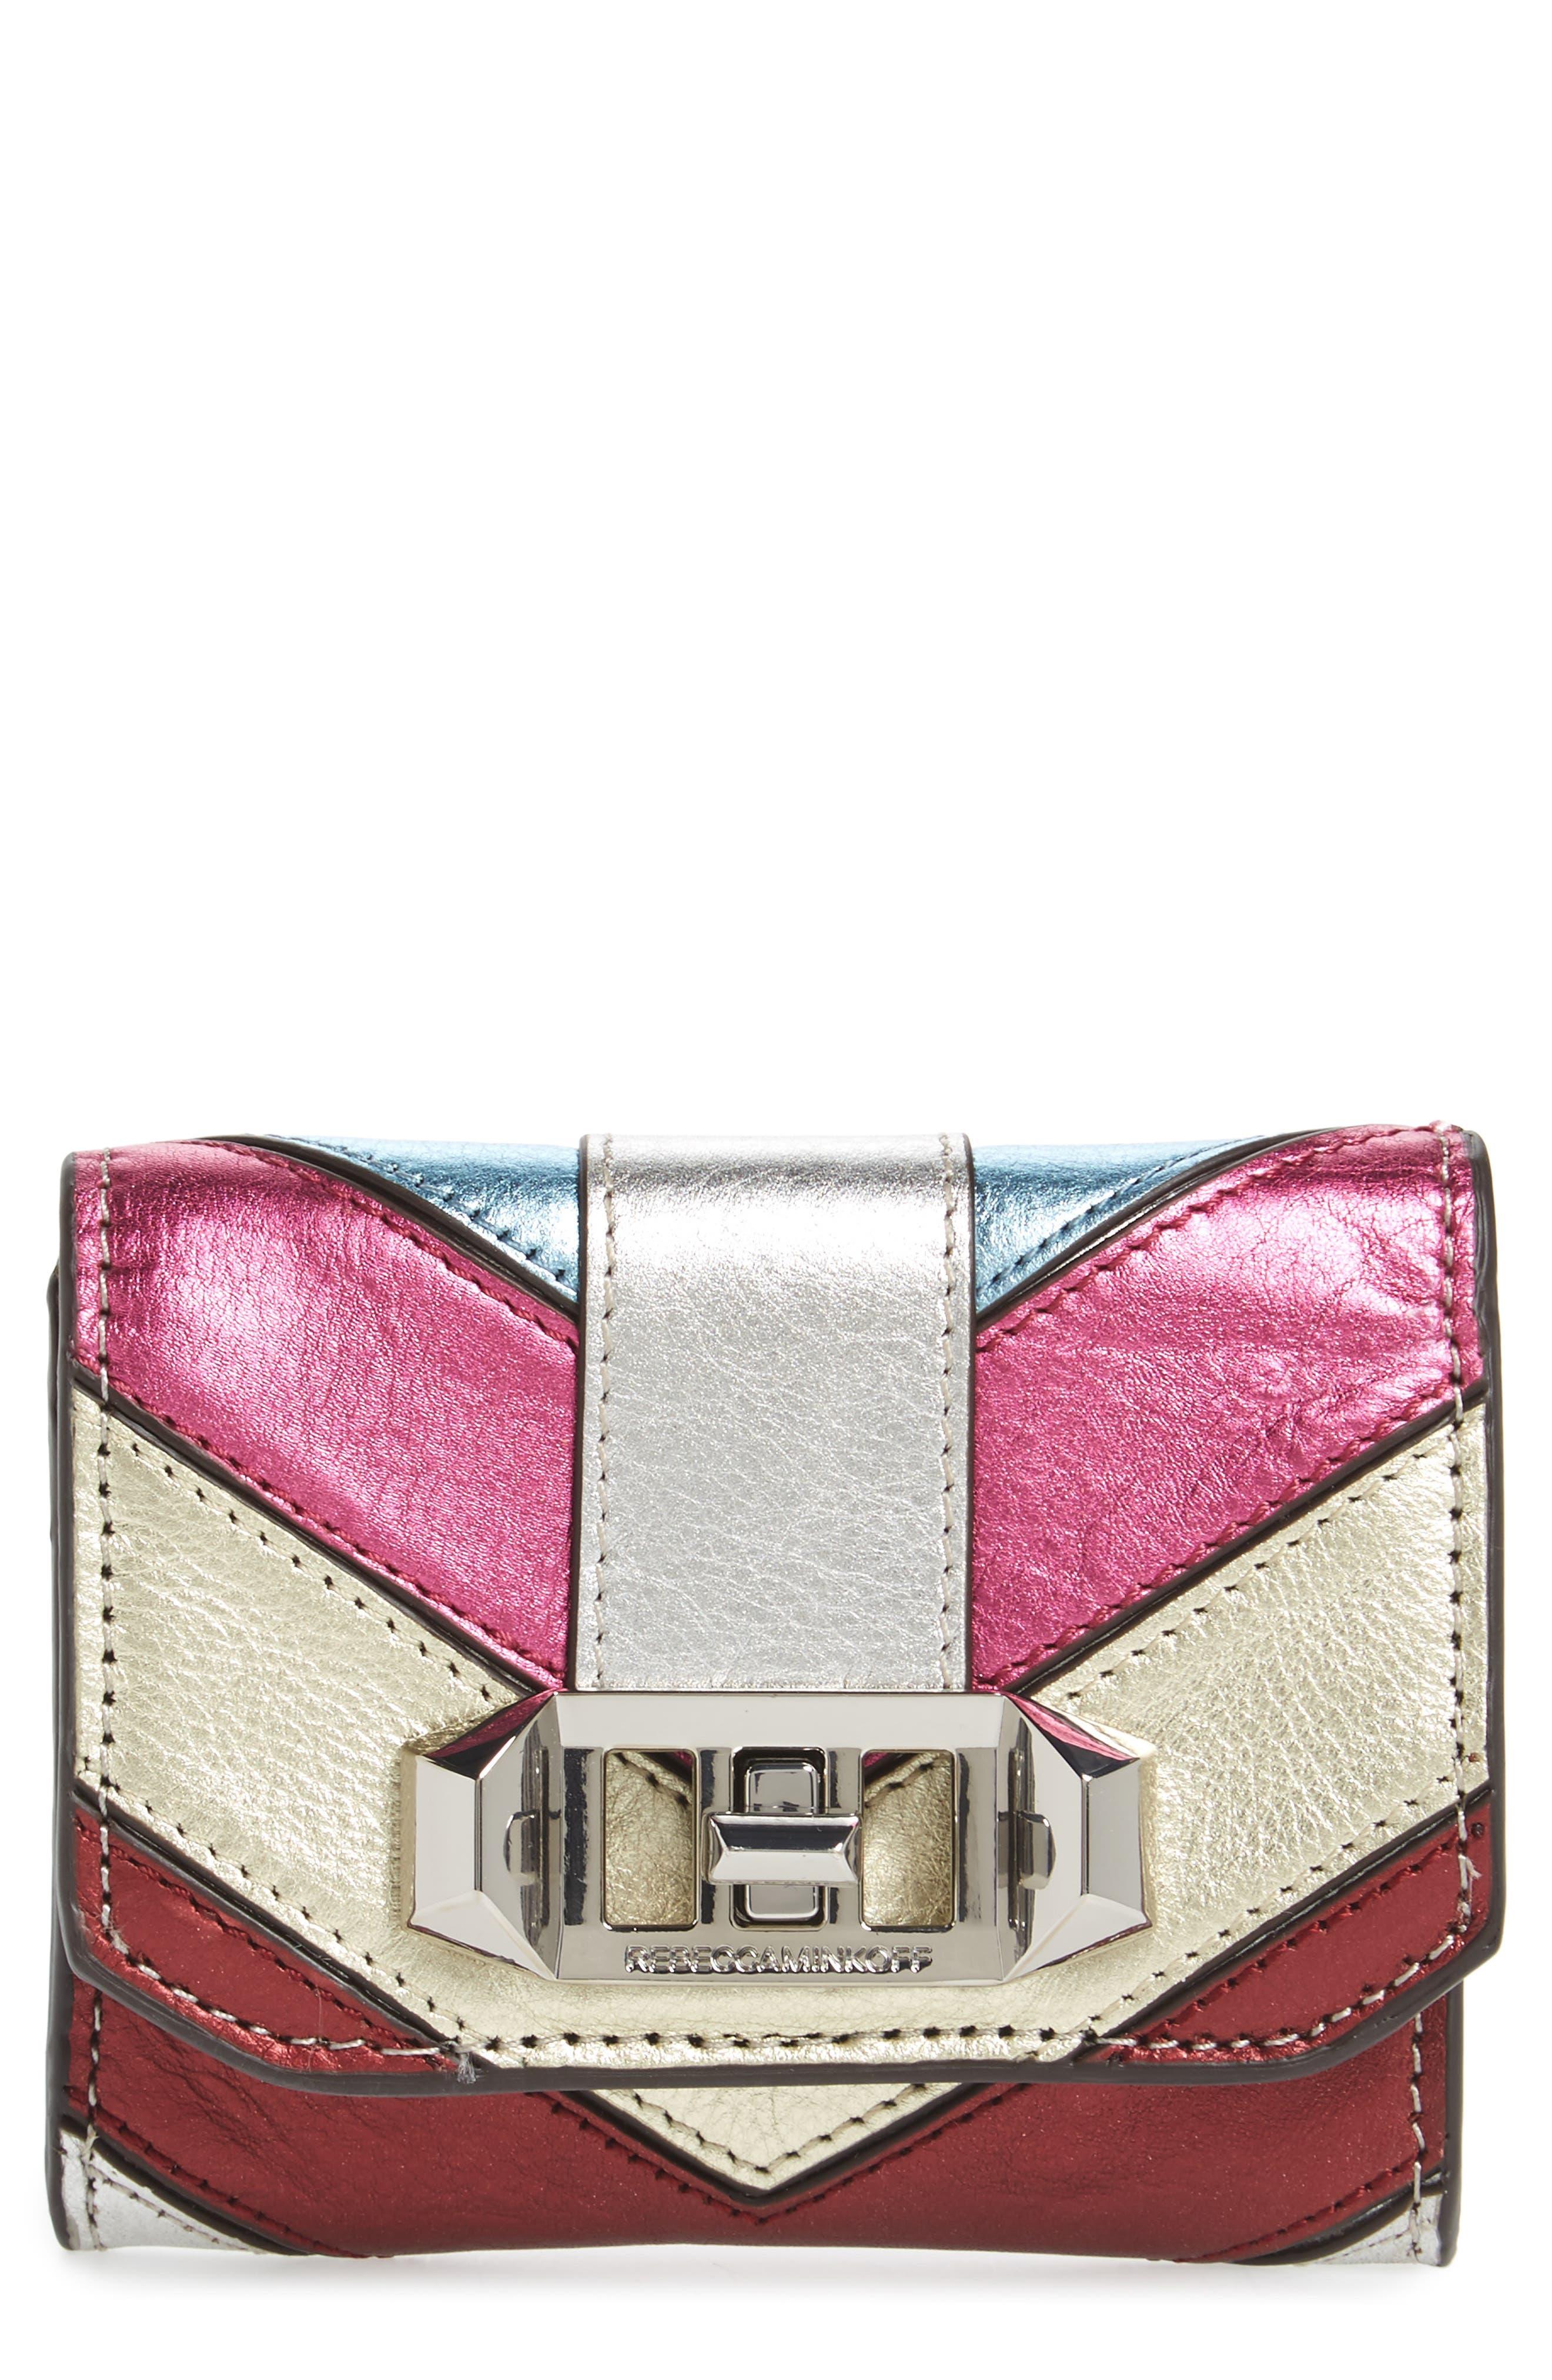 Alternate Image 1 Selected - Rebecca Minkoff Love Lock Leather Wallet